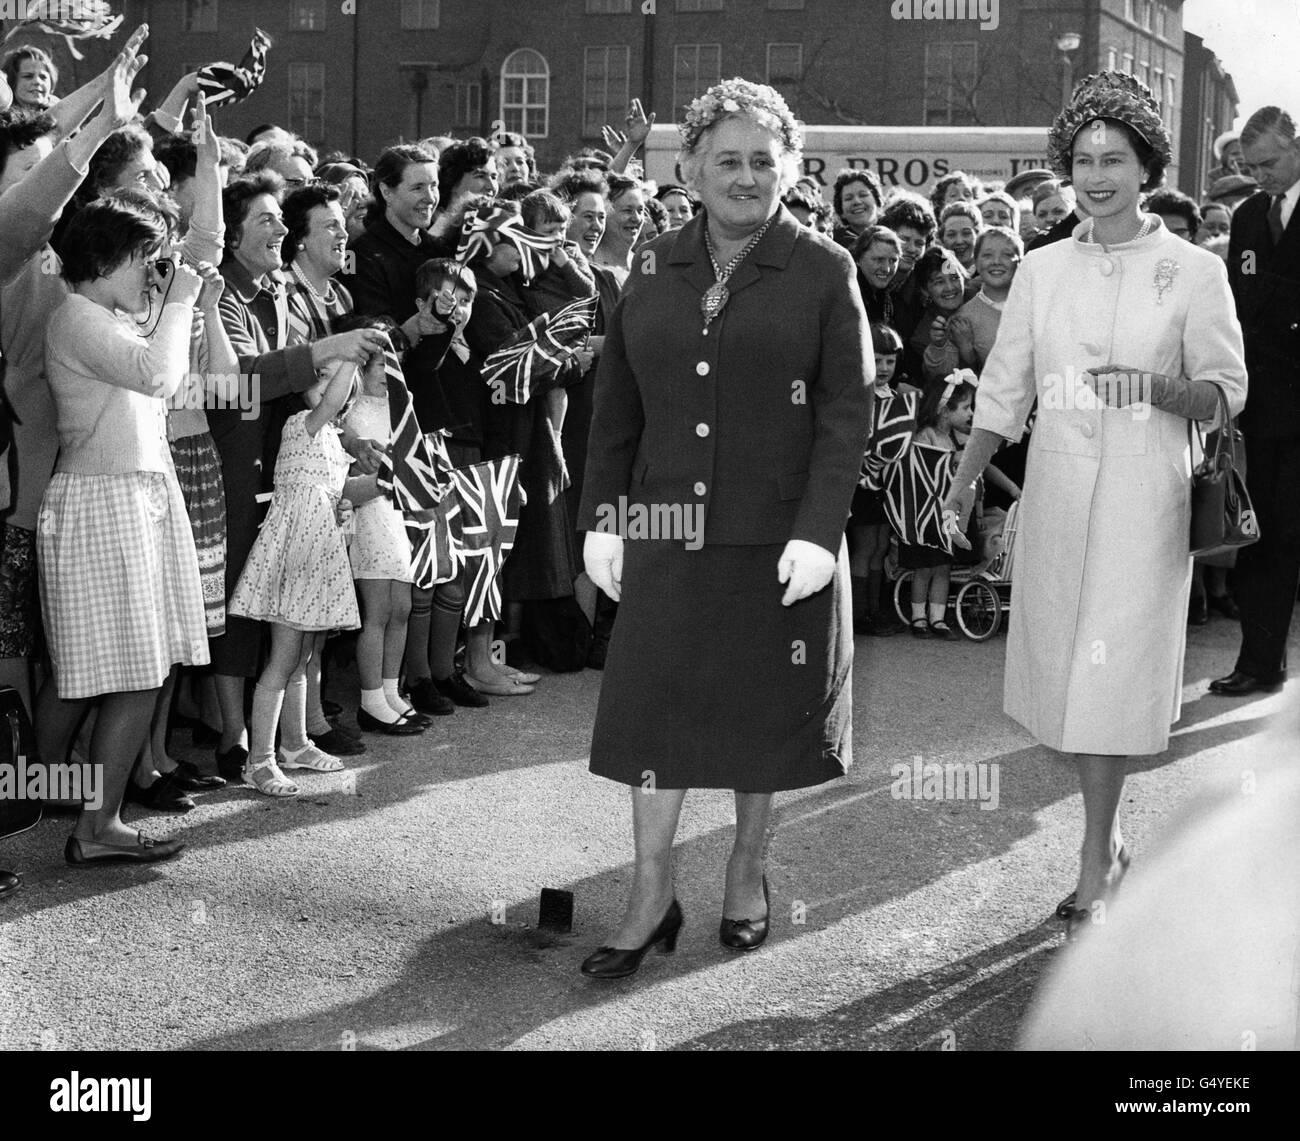 Royalty - Queen Elizabeth II - Polar, LondonStock Photo